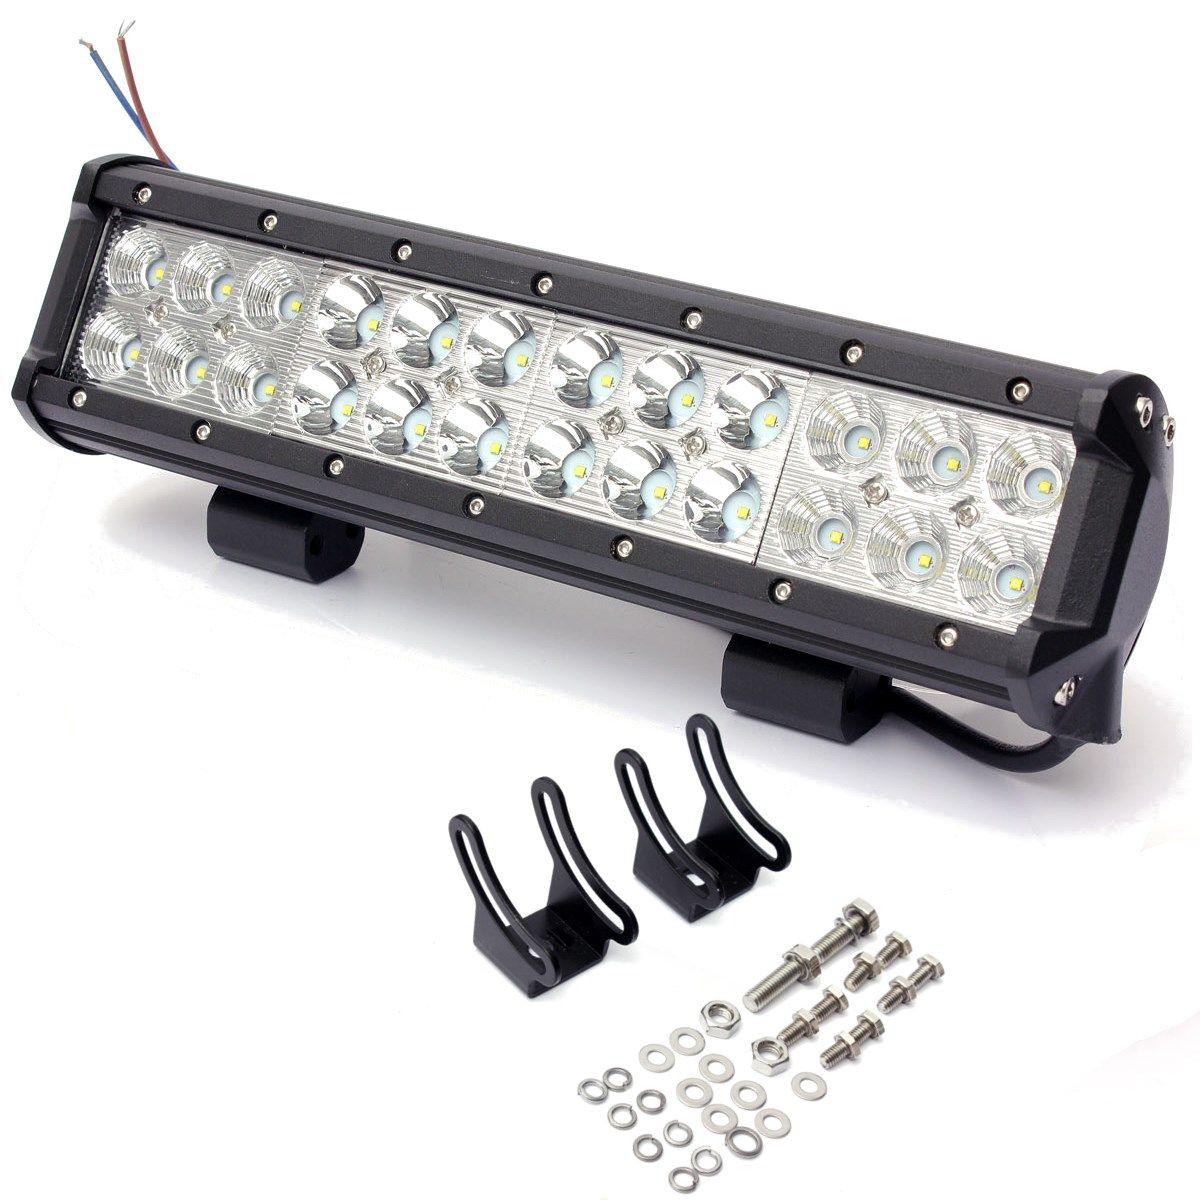 12 Inch 72W Off Road LED Work Light Bar Combo Beam Lamp